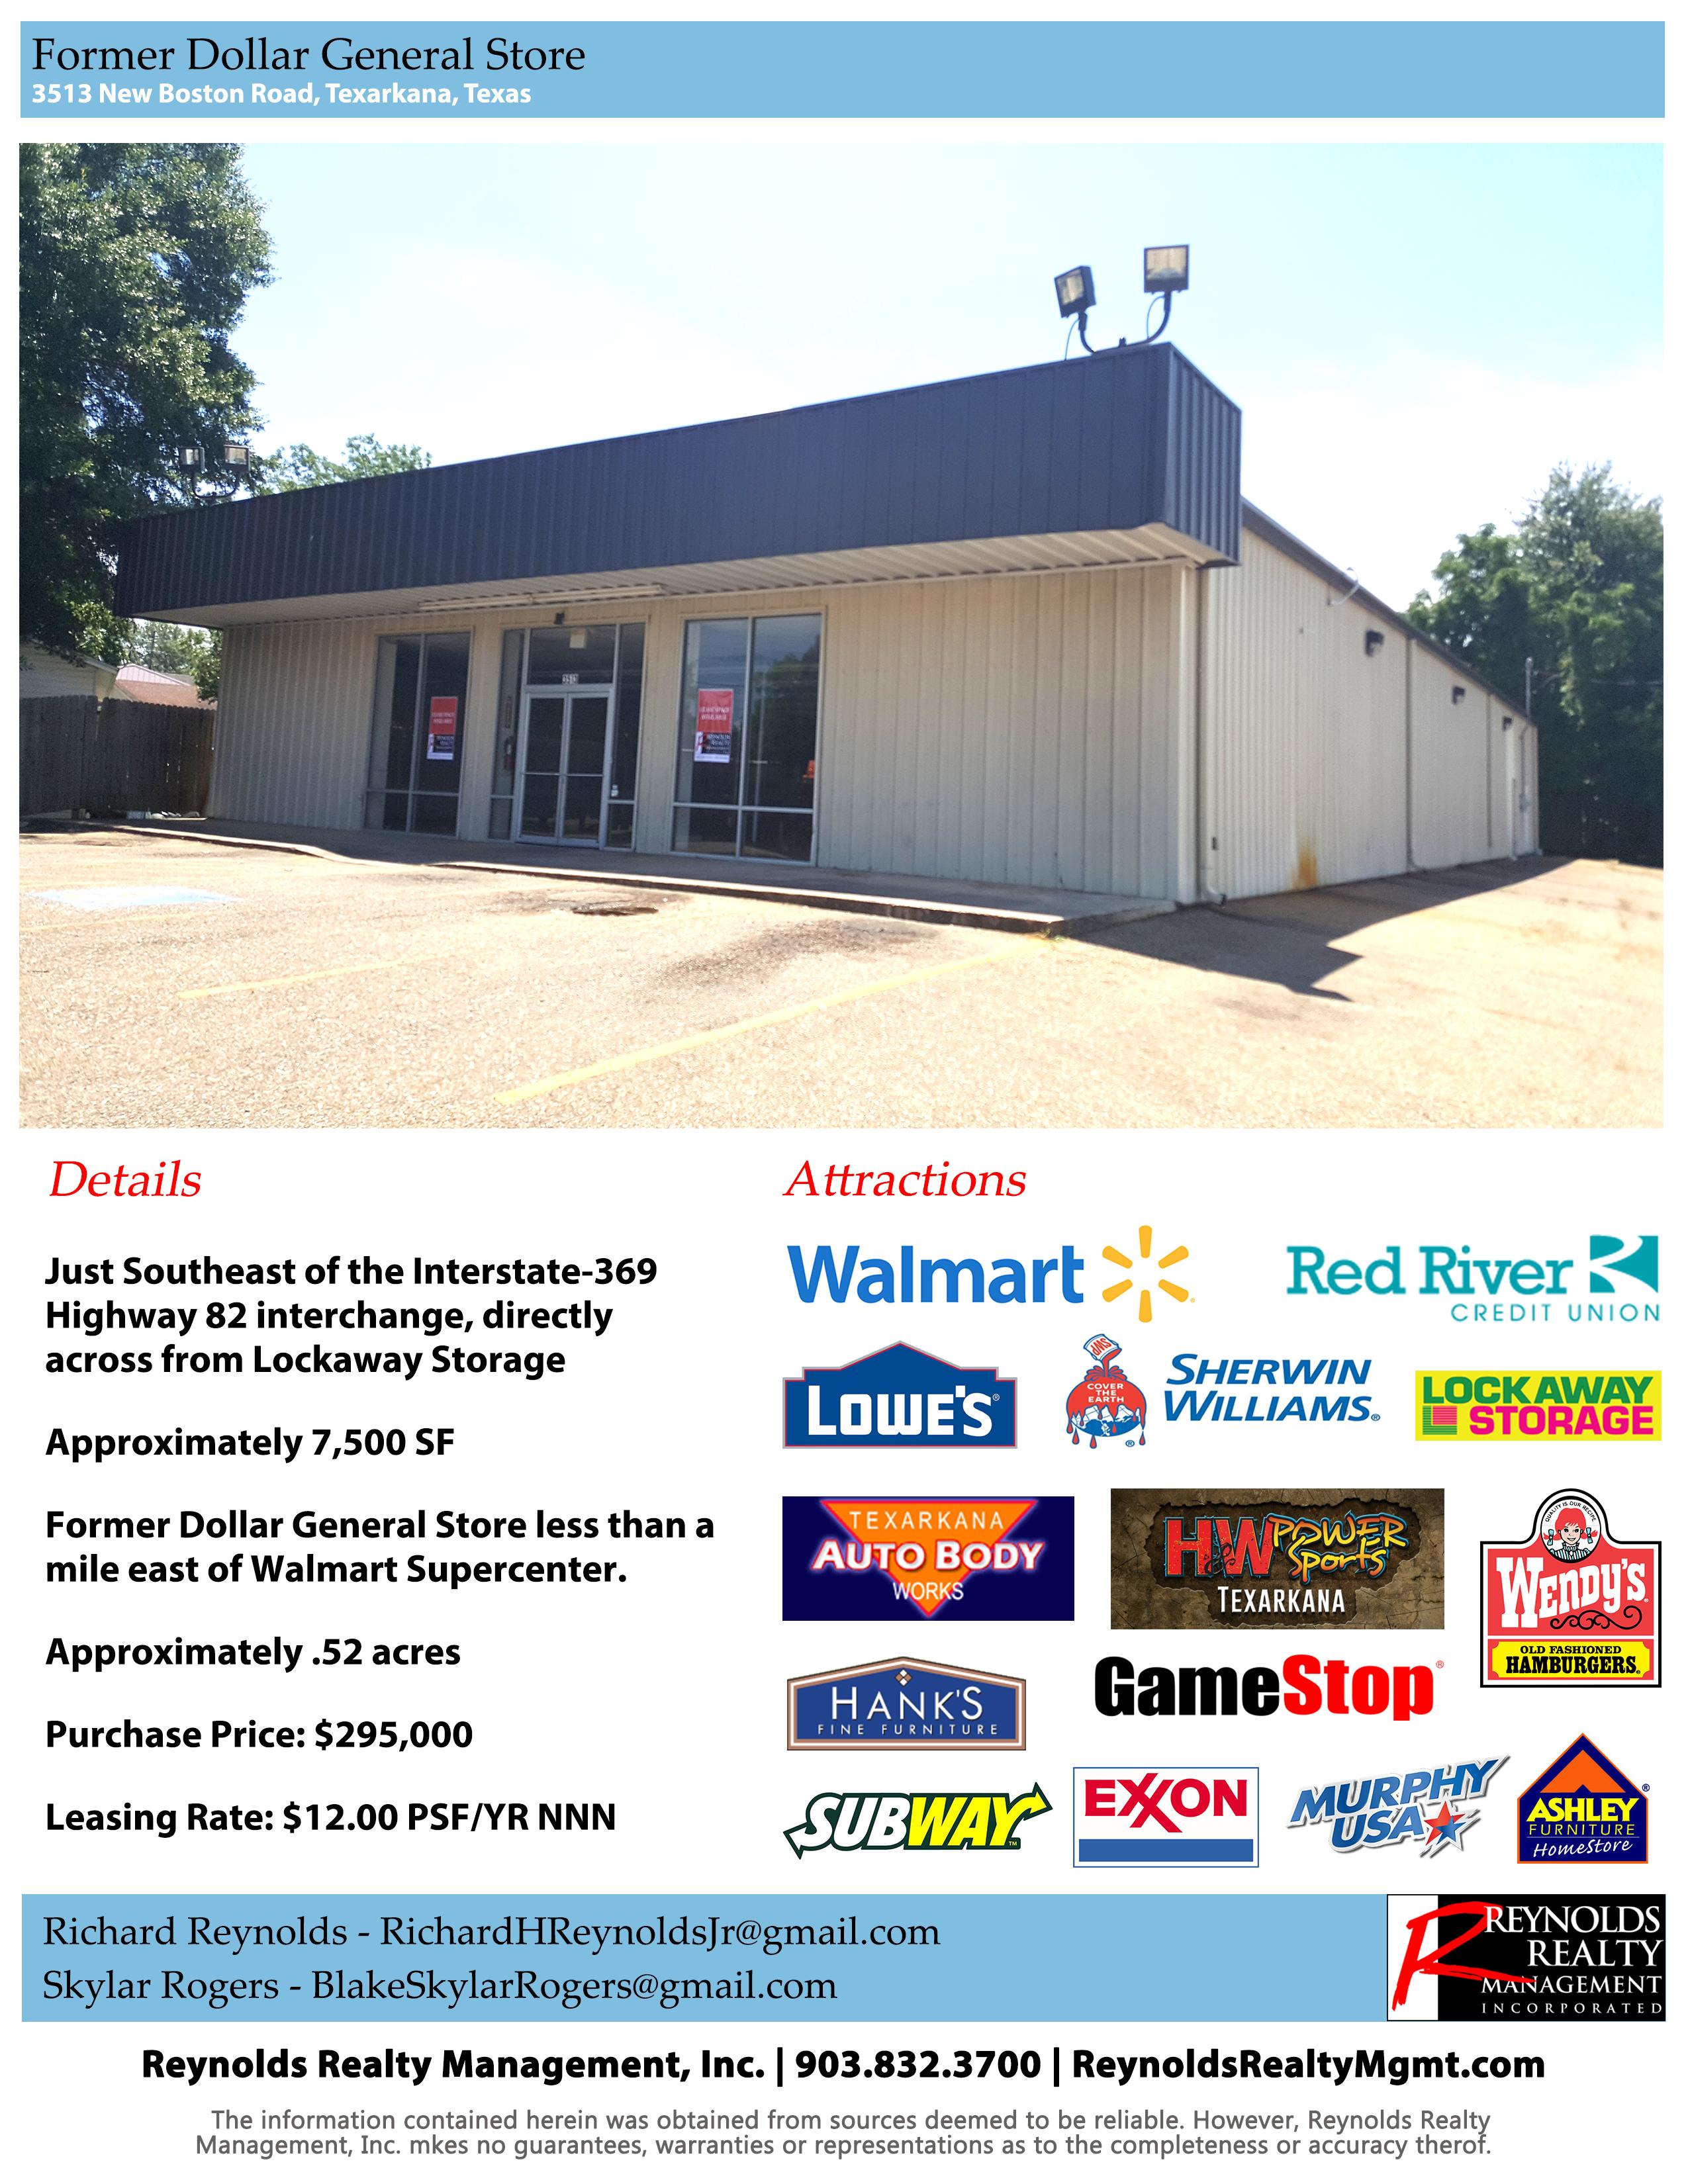 Former Dollar General, 3513 New Boston Road, Texarkana, TX ...